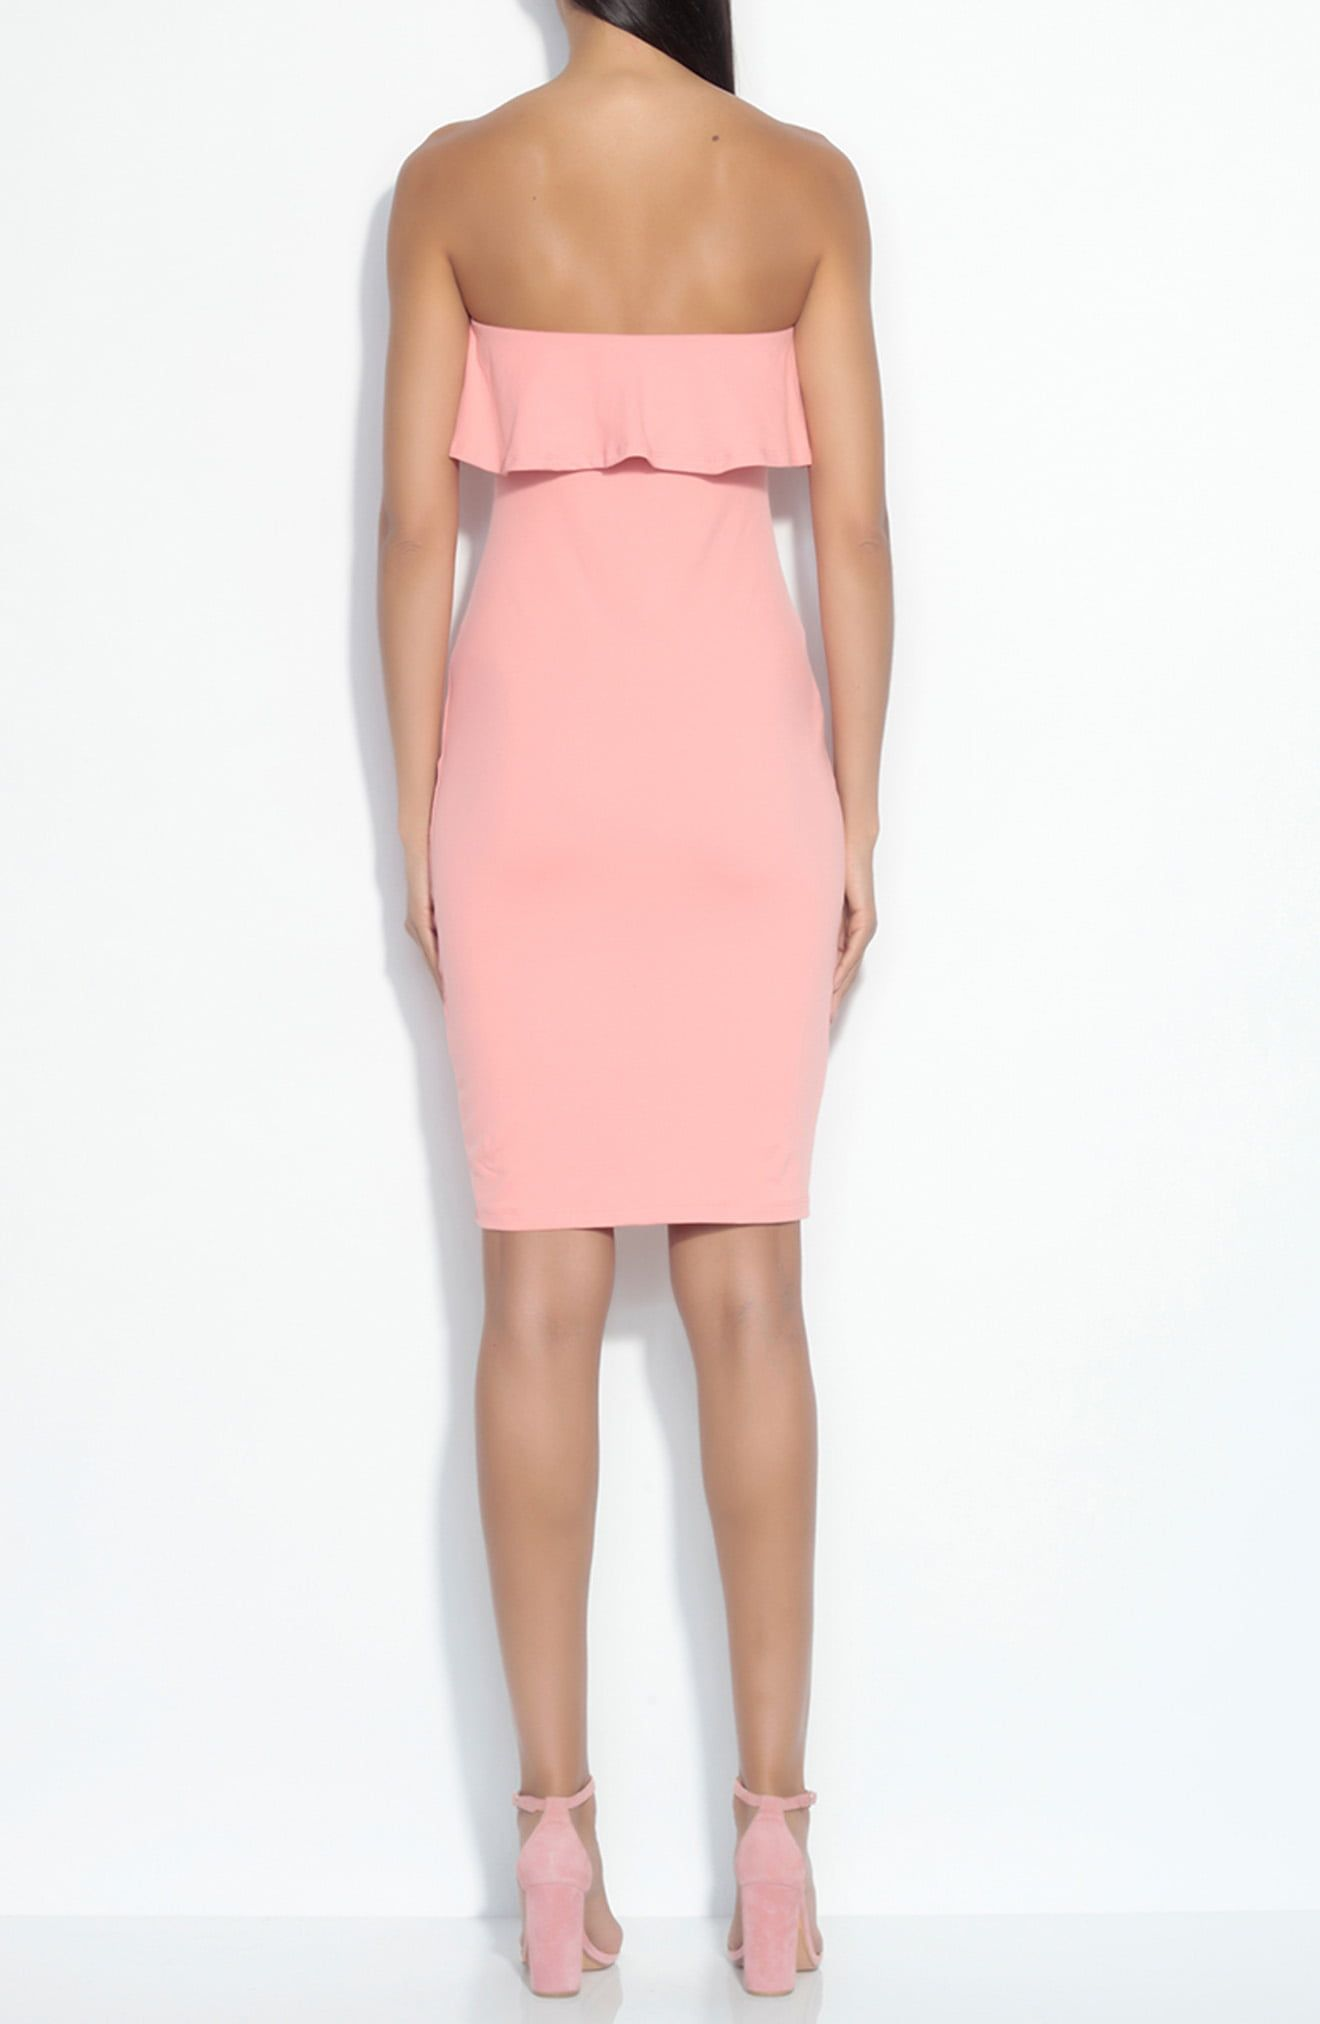 Susana Monaco Strapless Ruffle Dress Nordstrom In 2021 Ruffle Dress Strapless Ruffle Dress Dresses [ 2024 x 1320 Pixel ]